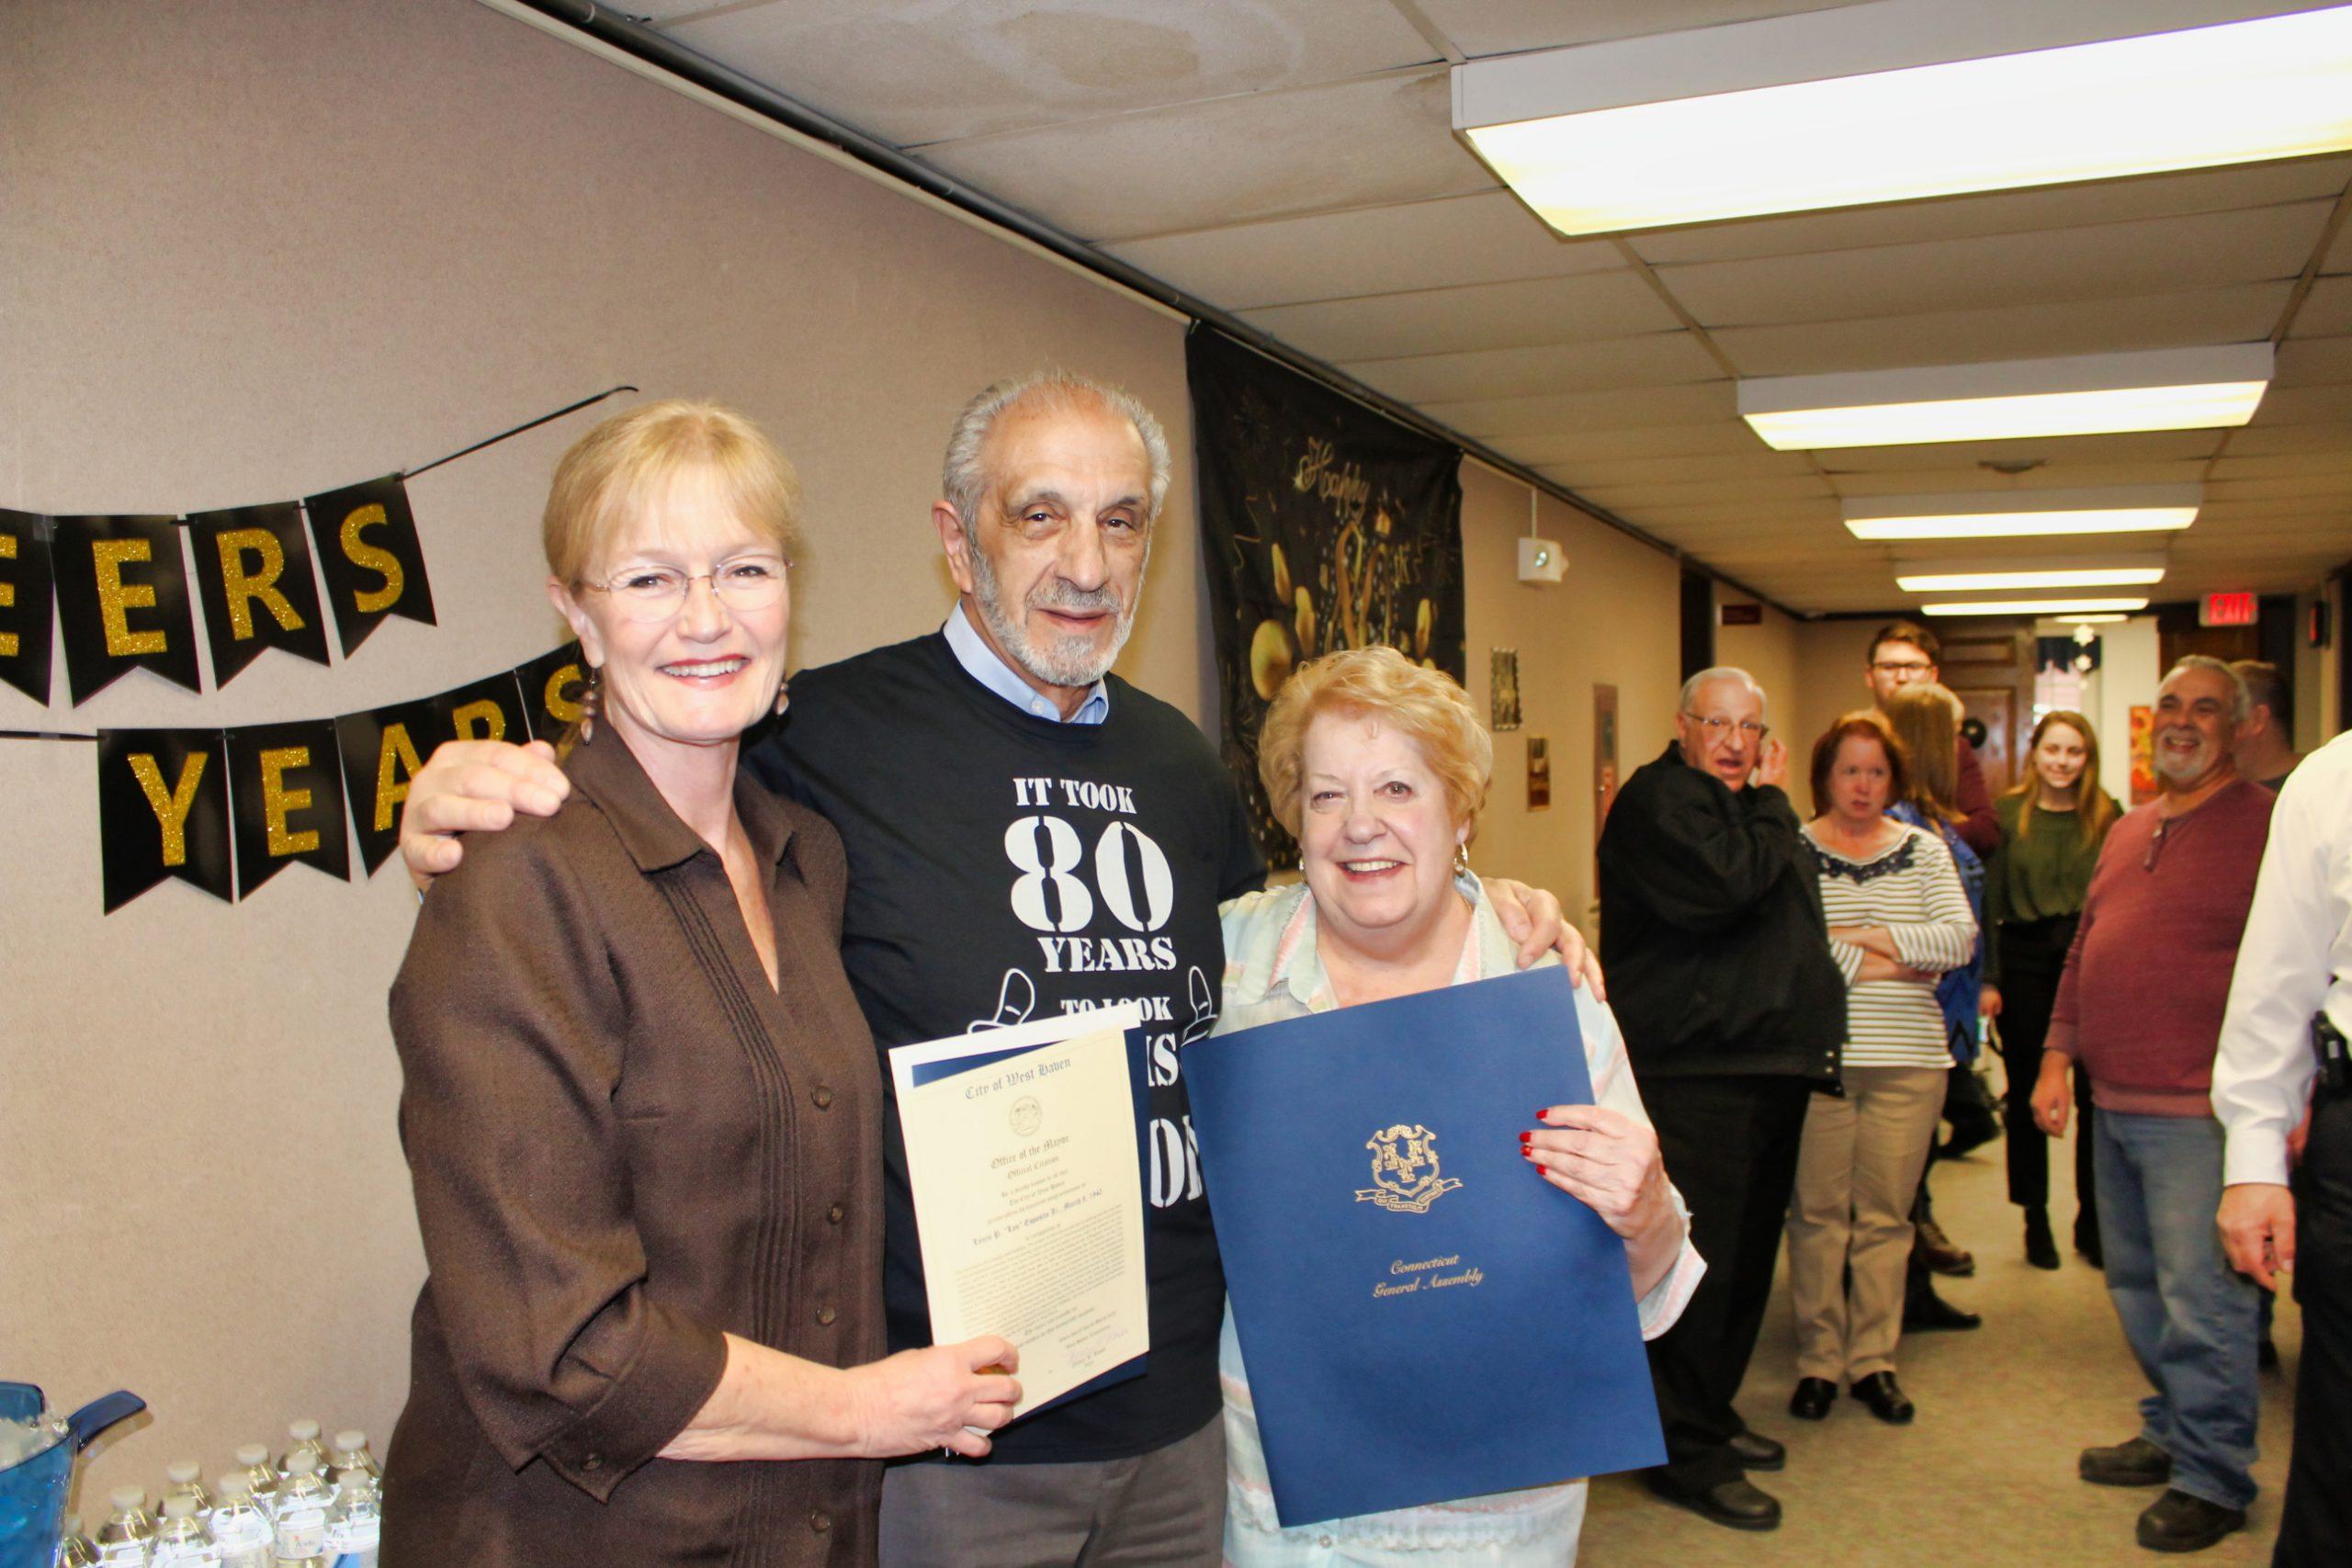 'Surprise' celebration marks Esposito's 80th birthday